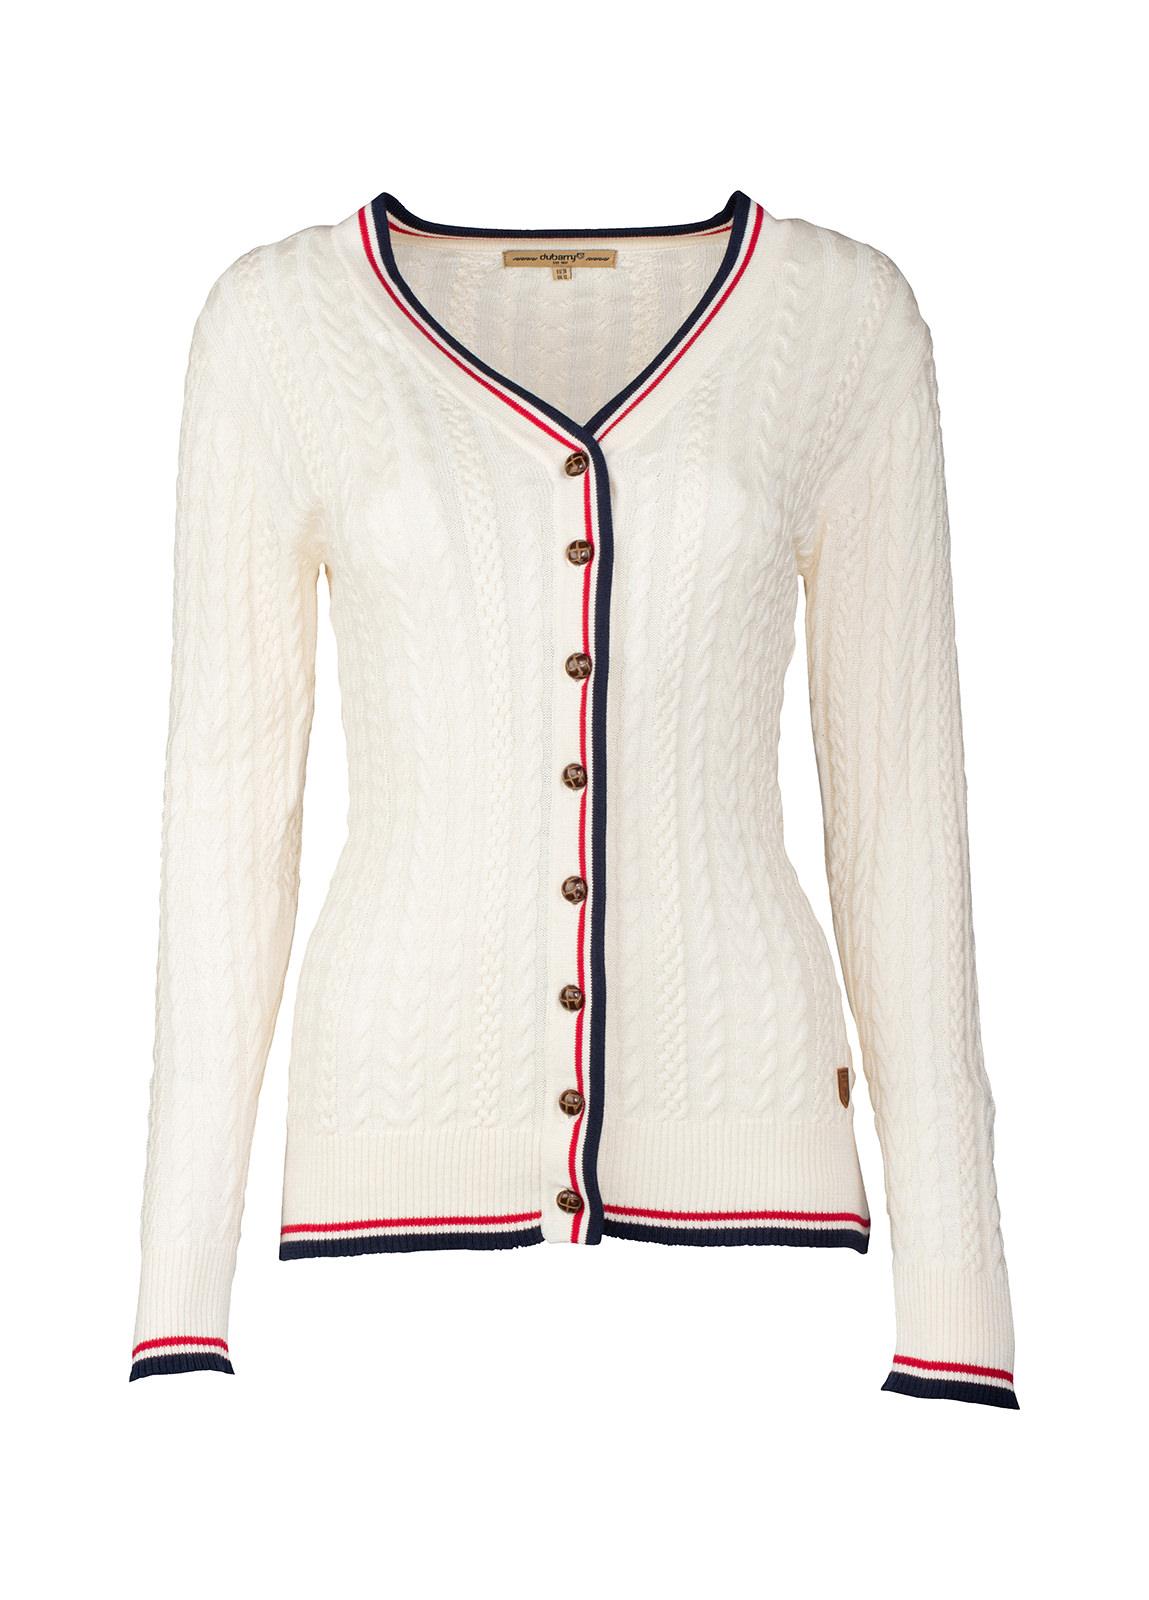 Dubarry_ Gort Ladies Cardigan - Sail White_Image_2